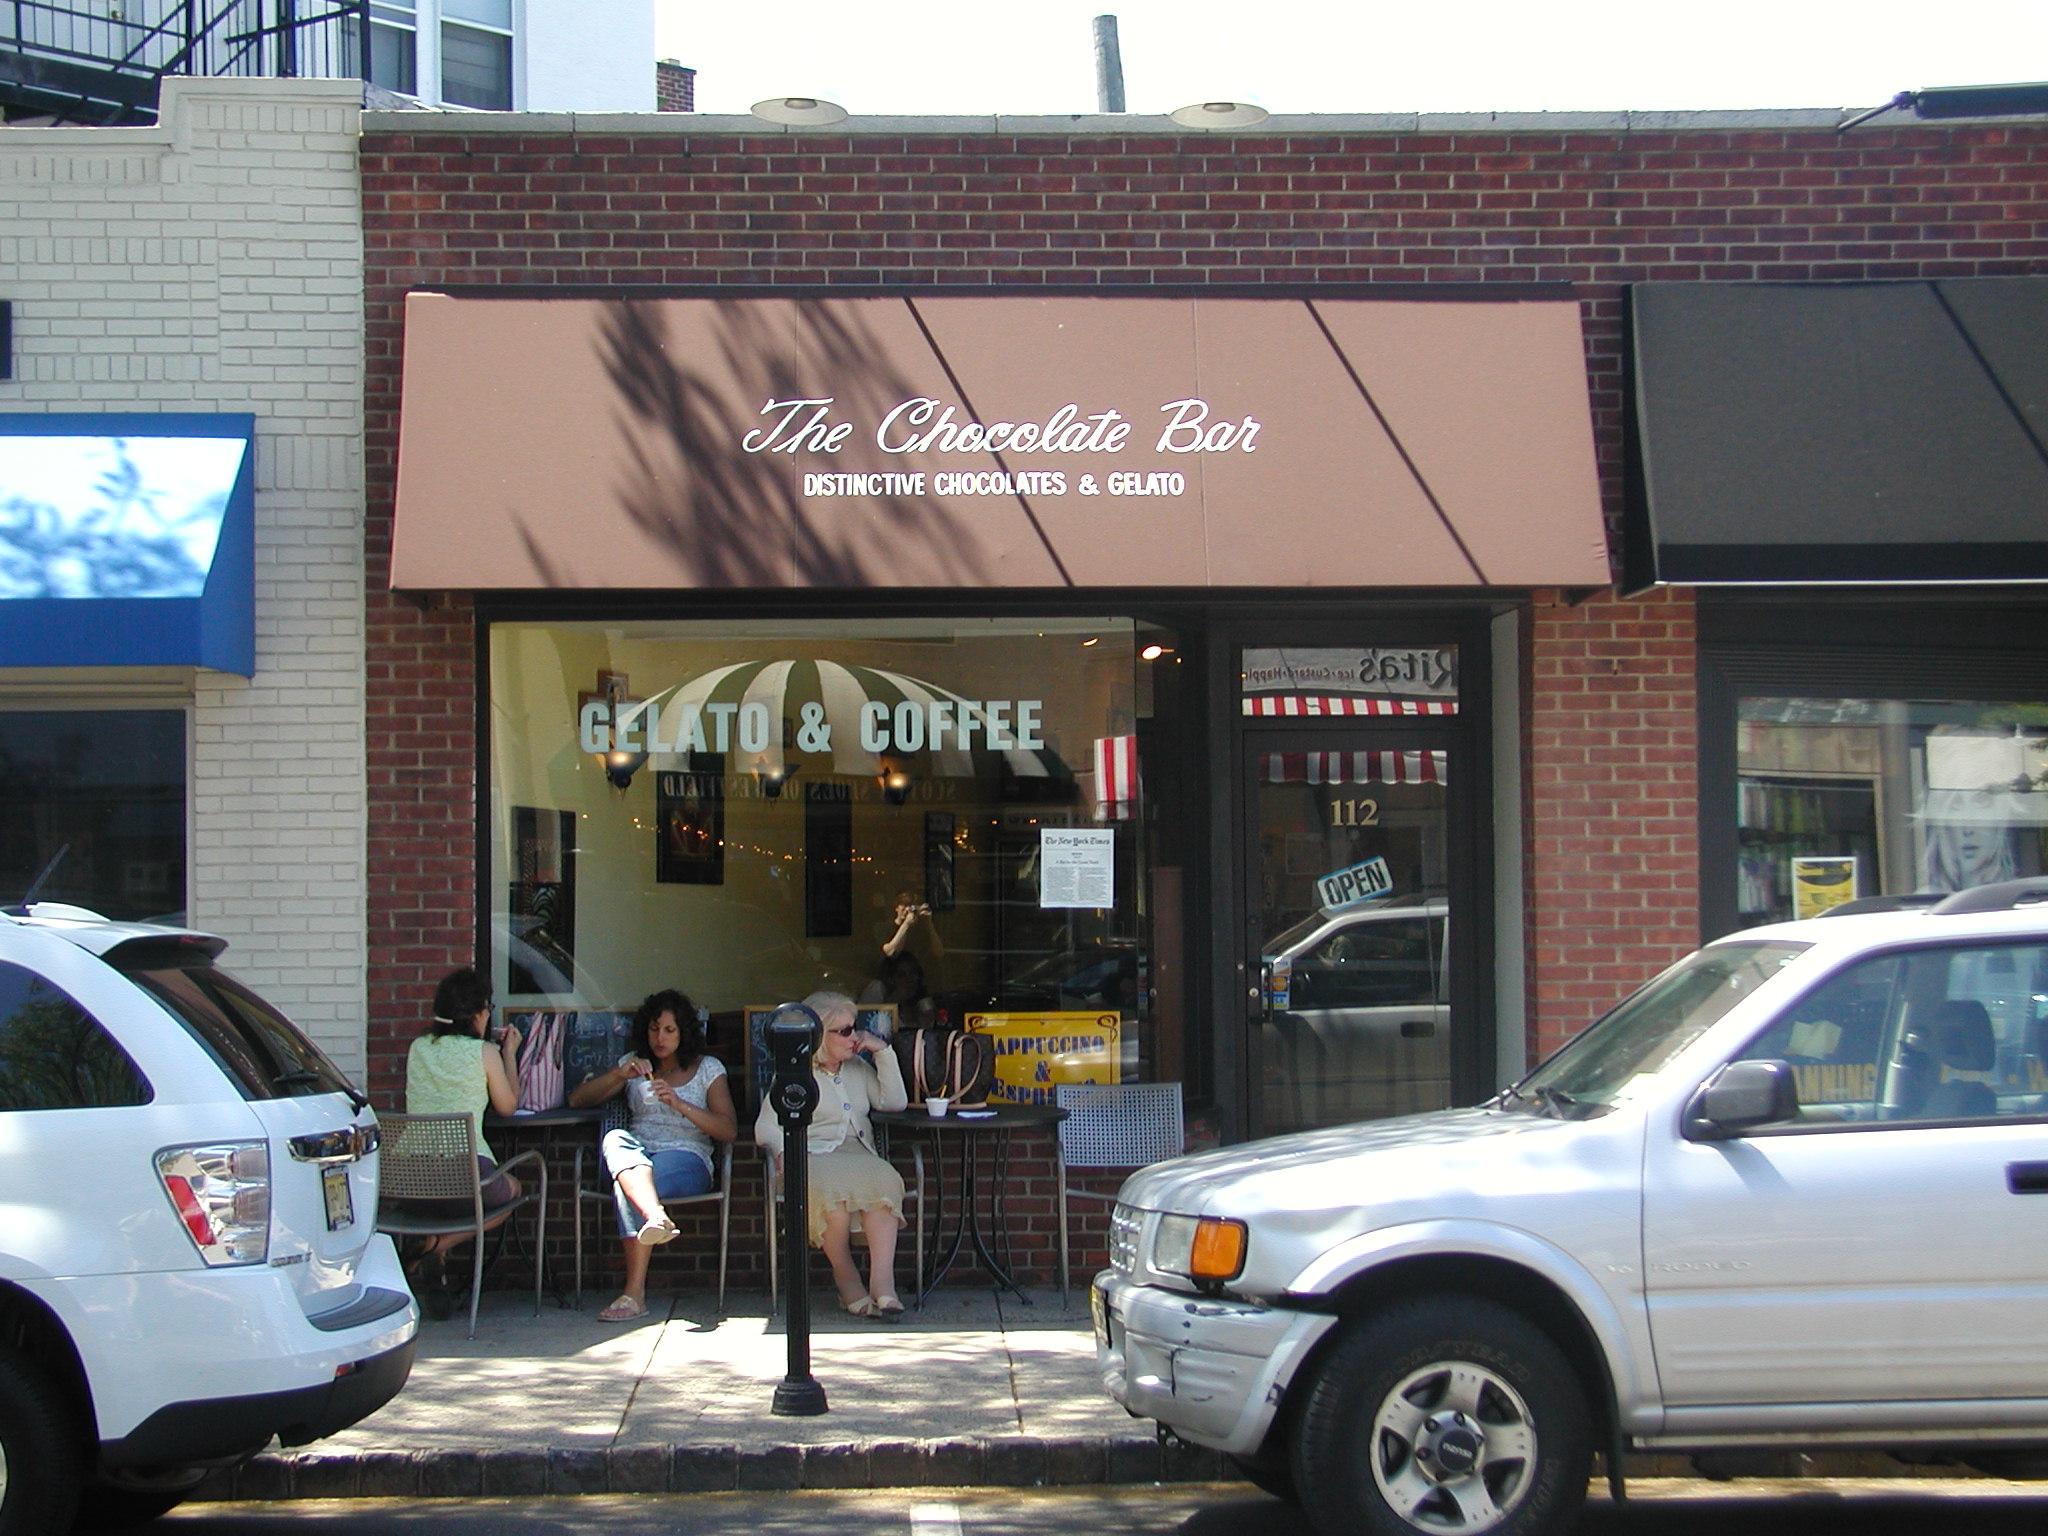 The Chocolate Bar - Thomas DiGiorgio Architecture - Westfield, NJ ...